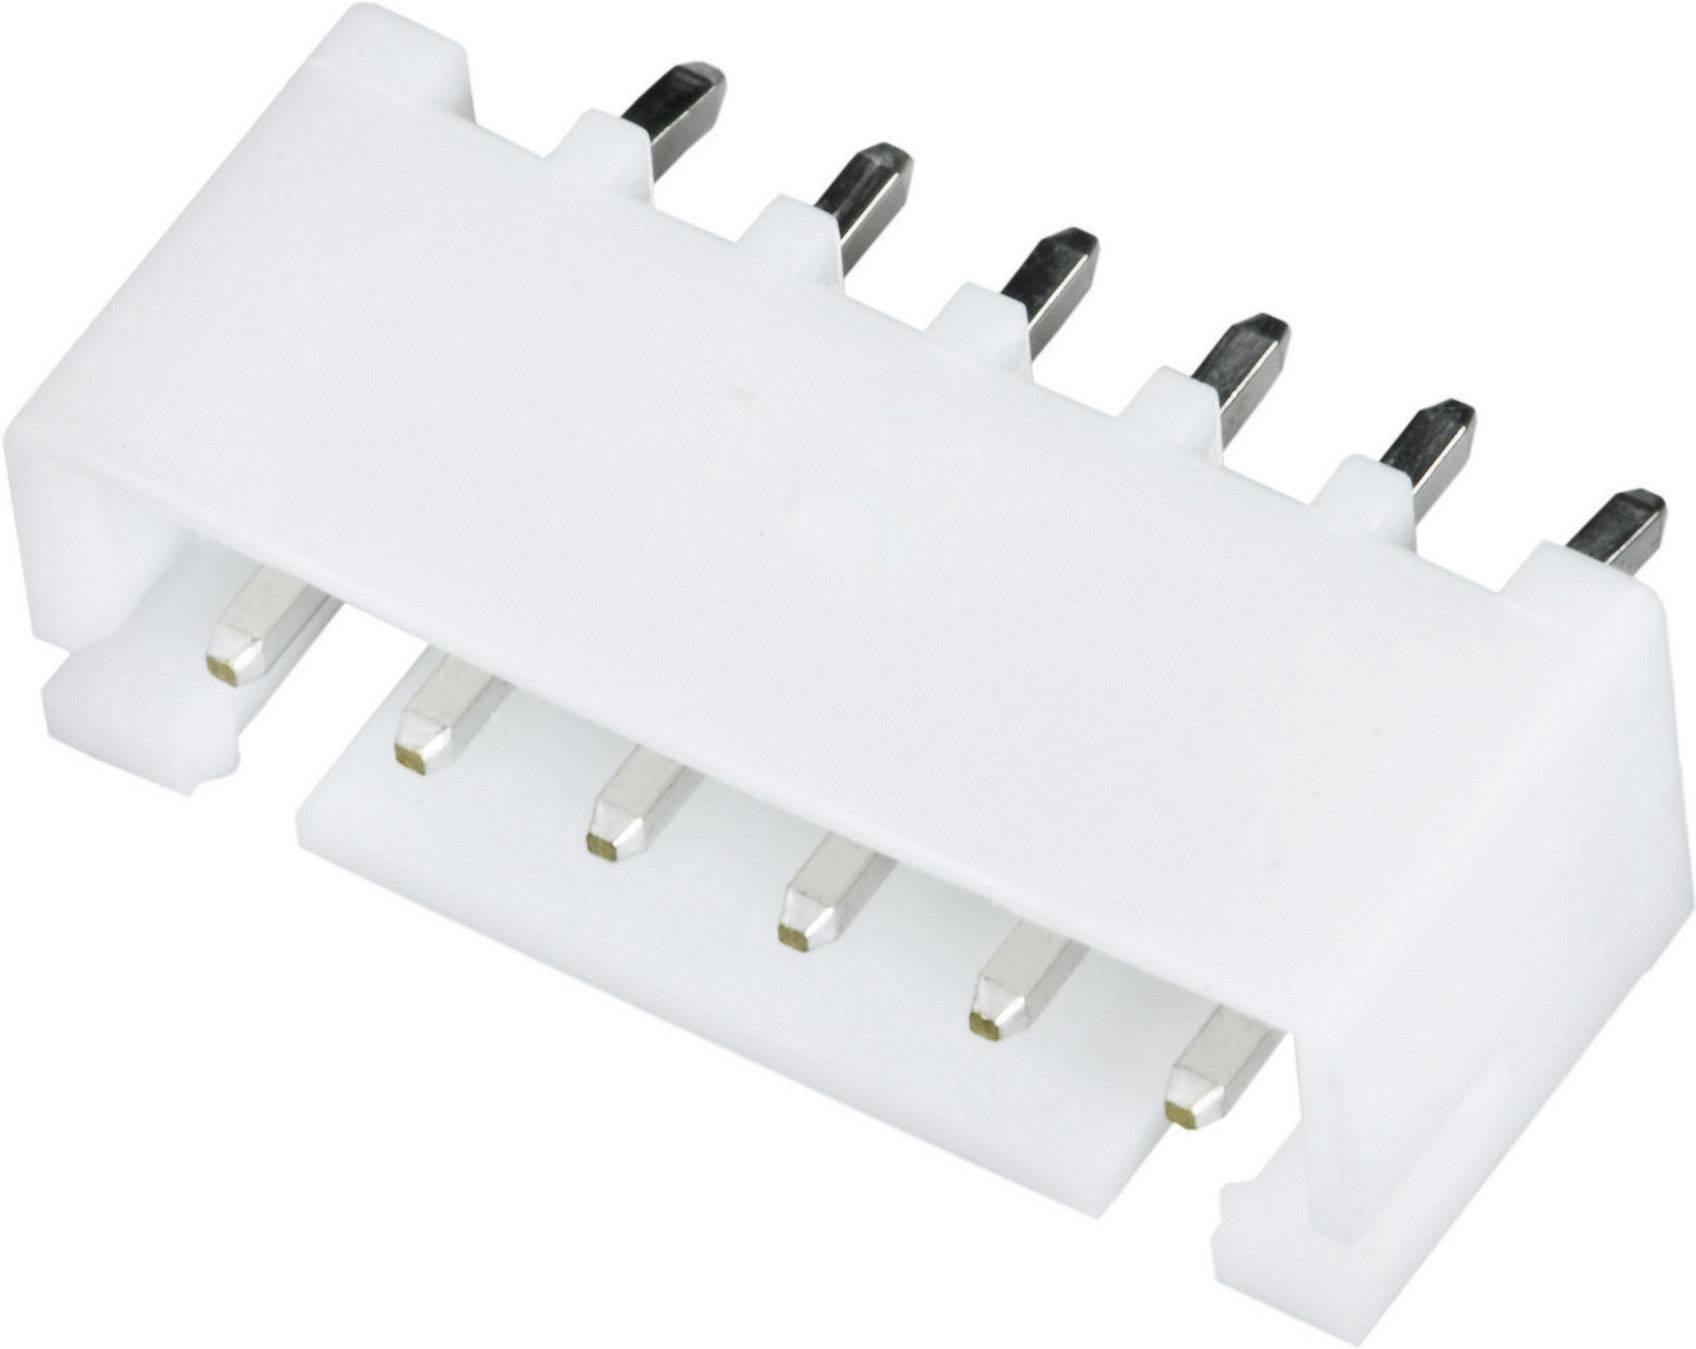 Pinová lišta (štandardná) JST B2B-XH-A (LF)(SN) 800359, 5.75 mm, pólů 2, rozteč 2.50 mm, 1 ks